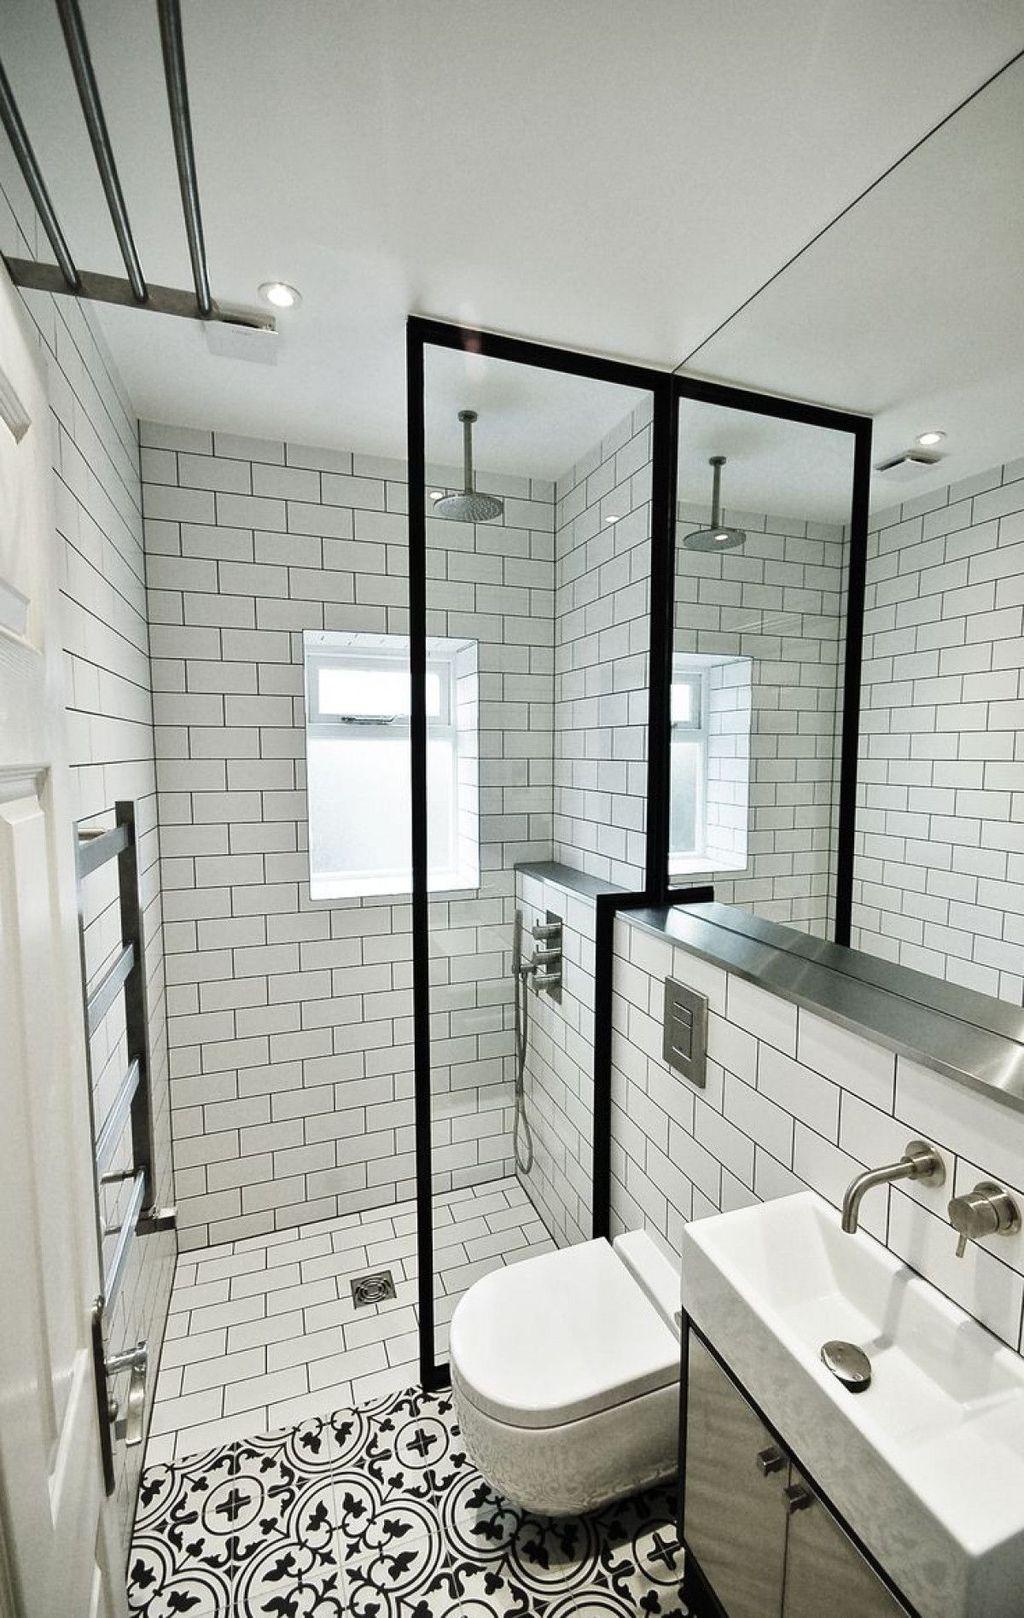 Lovely Bathroom Ceramic Tile Ideas You Should Copy 20